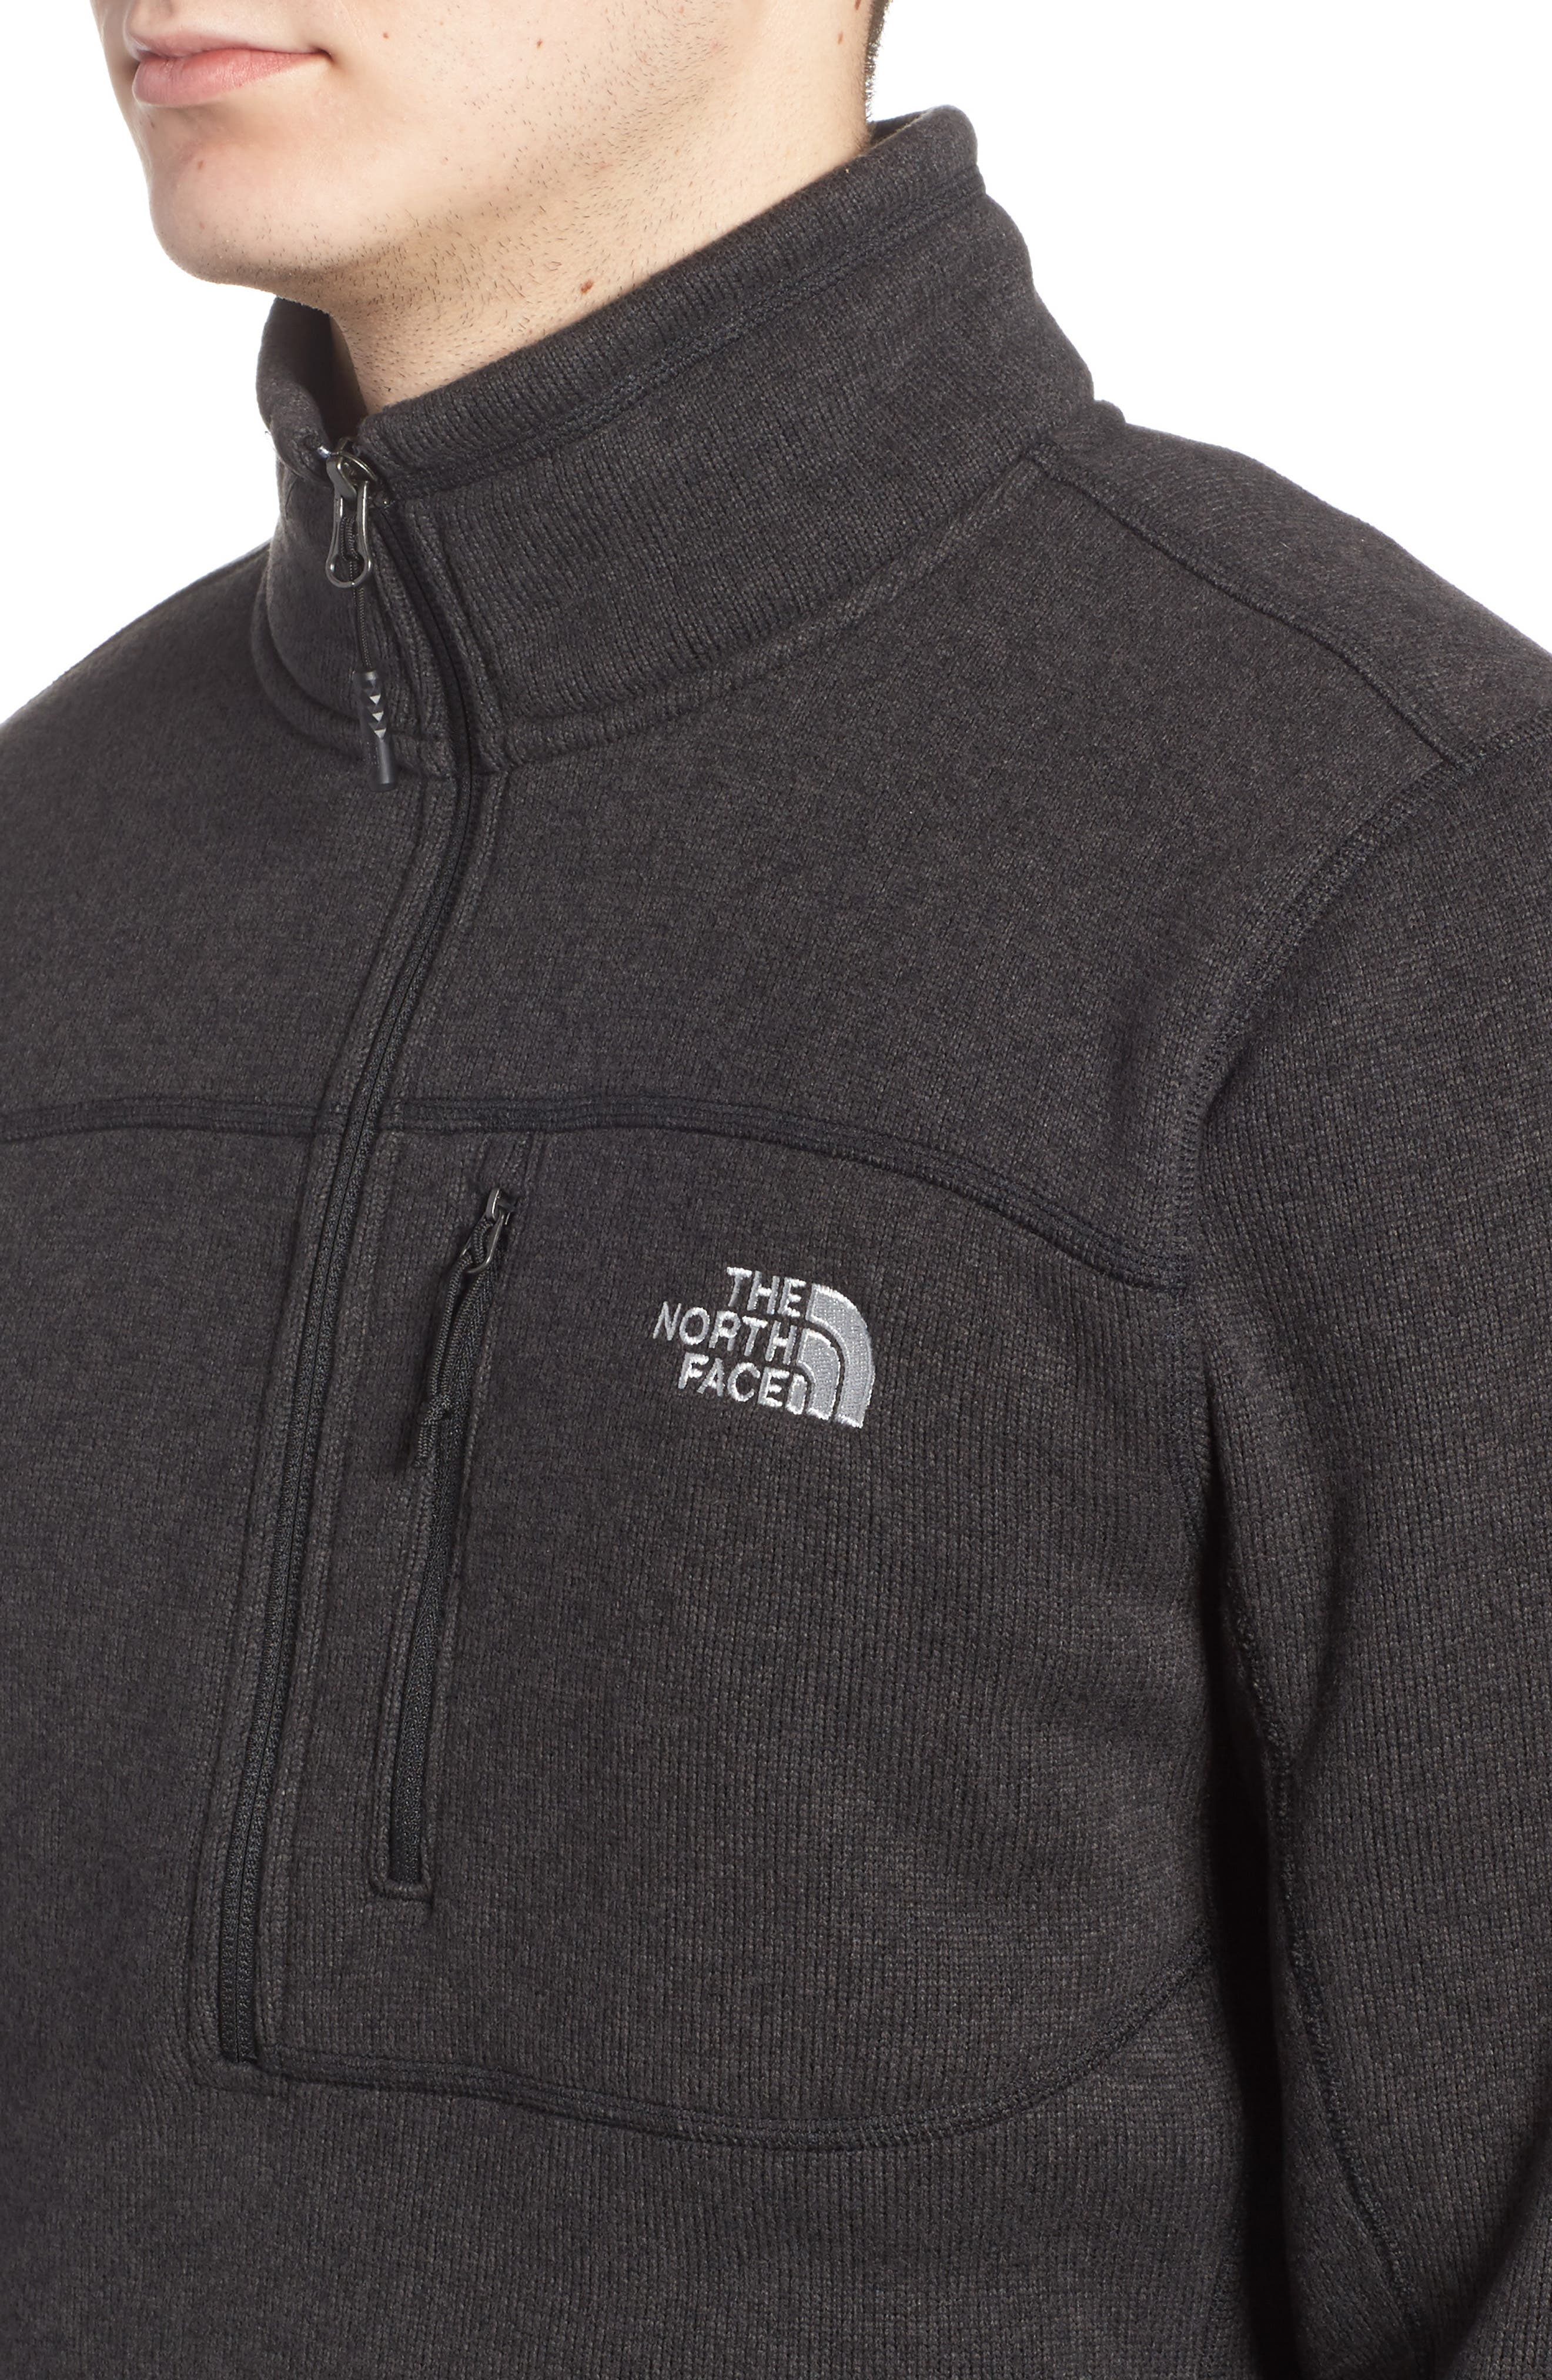 THE NORTH FACE, Gordon Lyons Quarter-Zip Fleece Jacket, Alternate thumbnail 5, color, 001